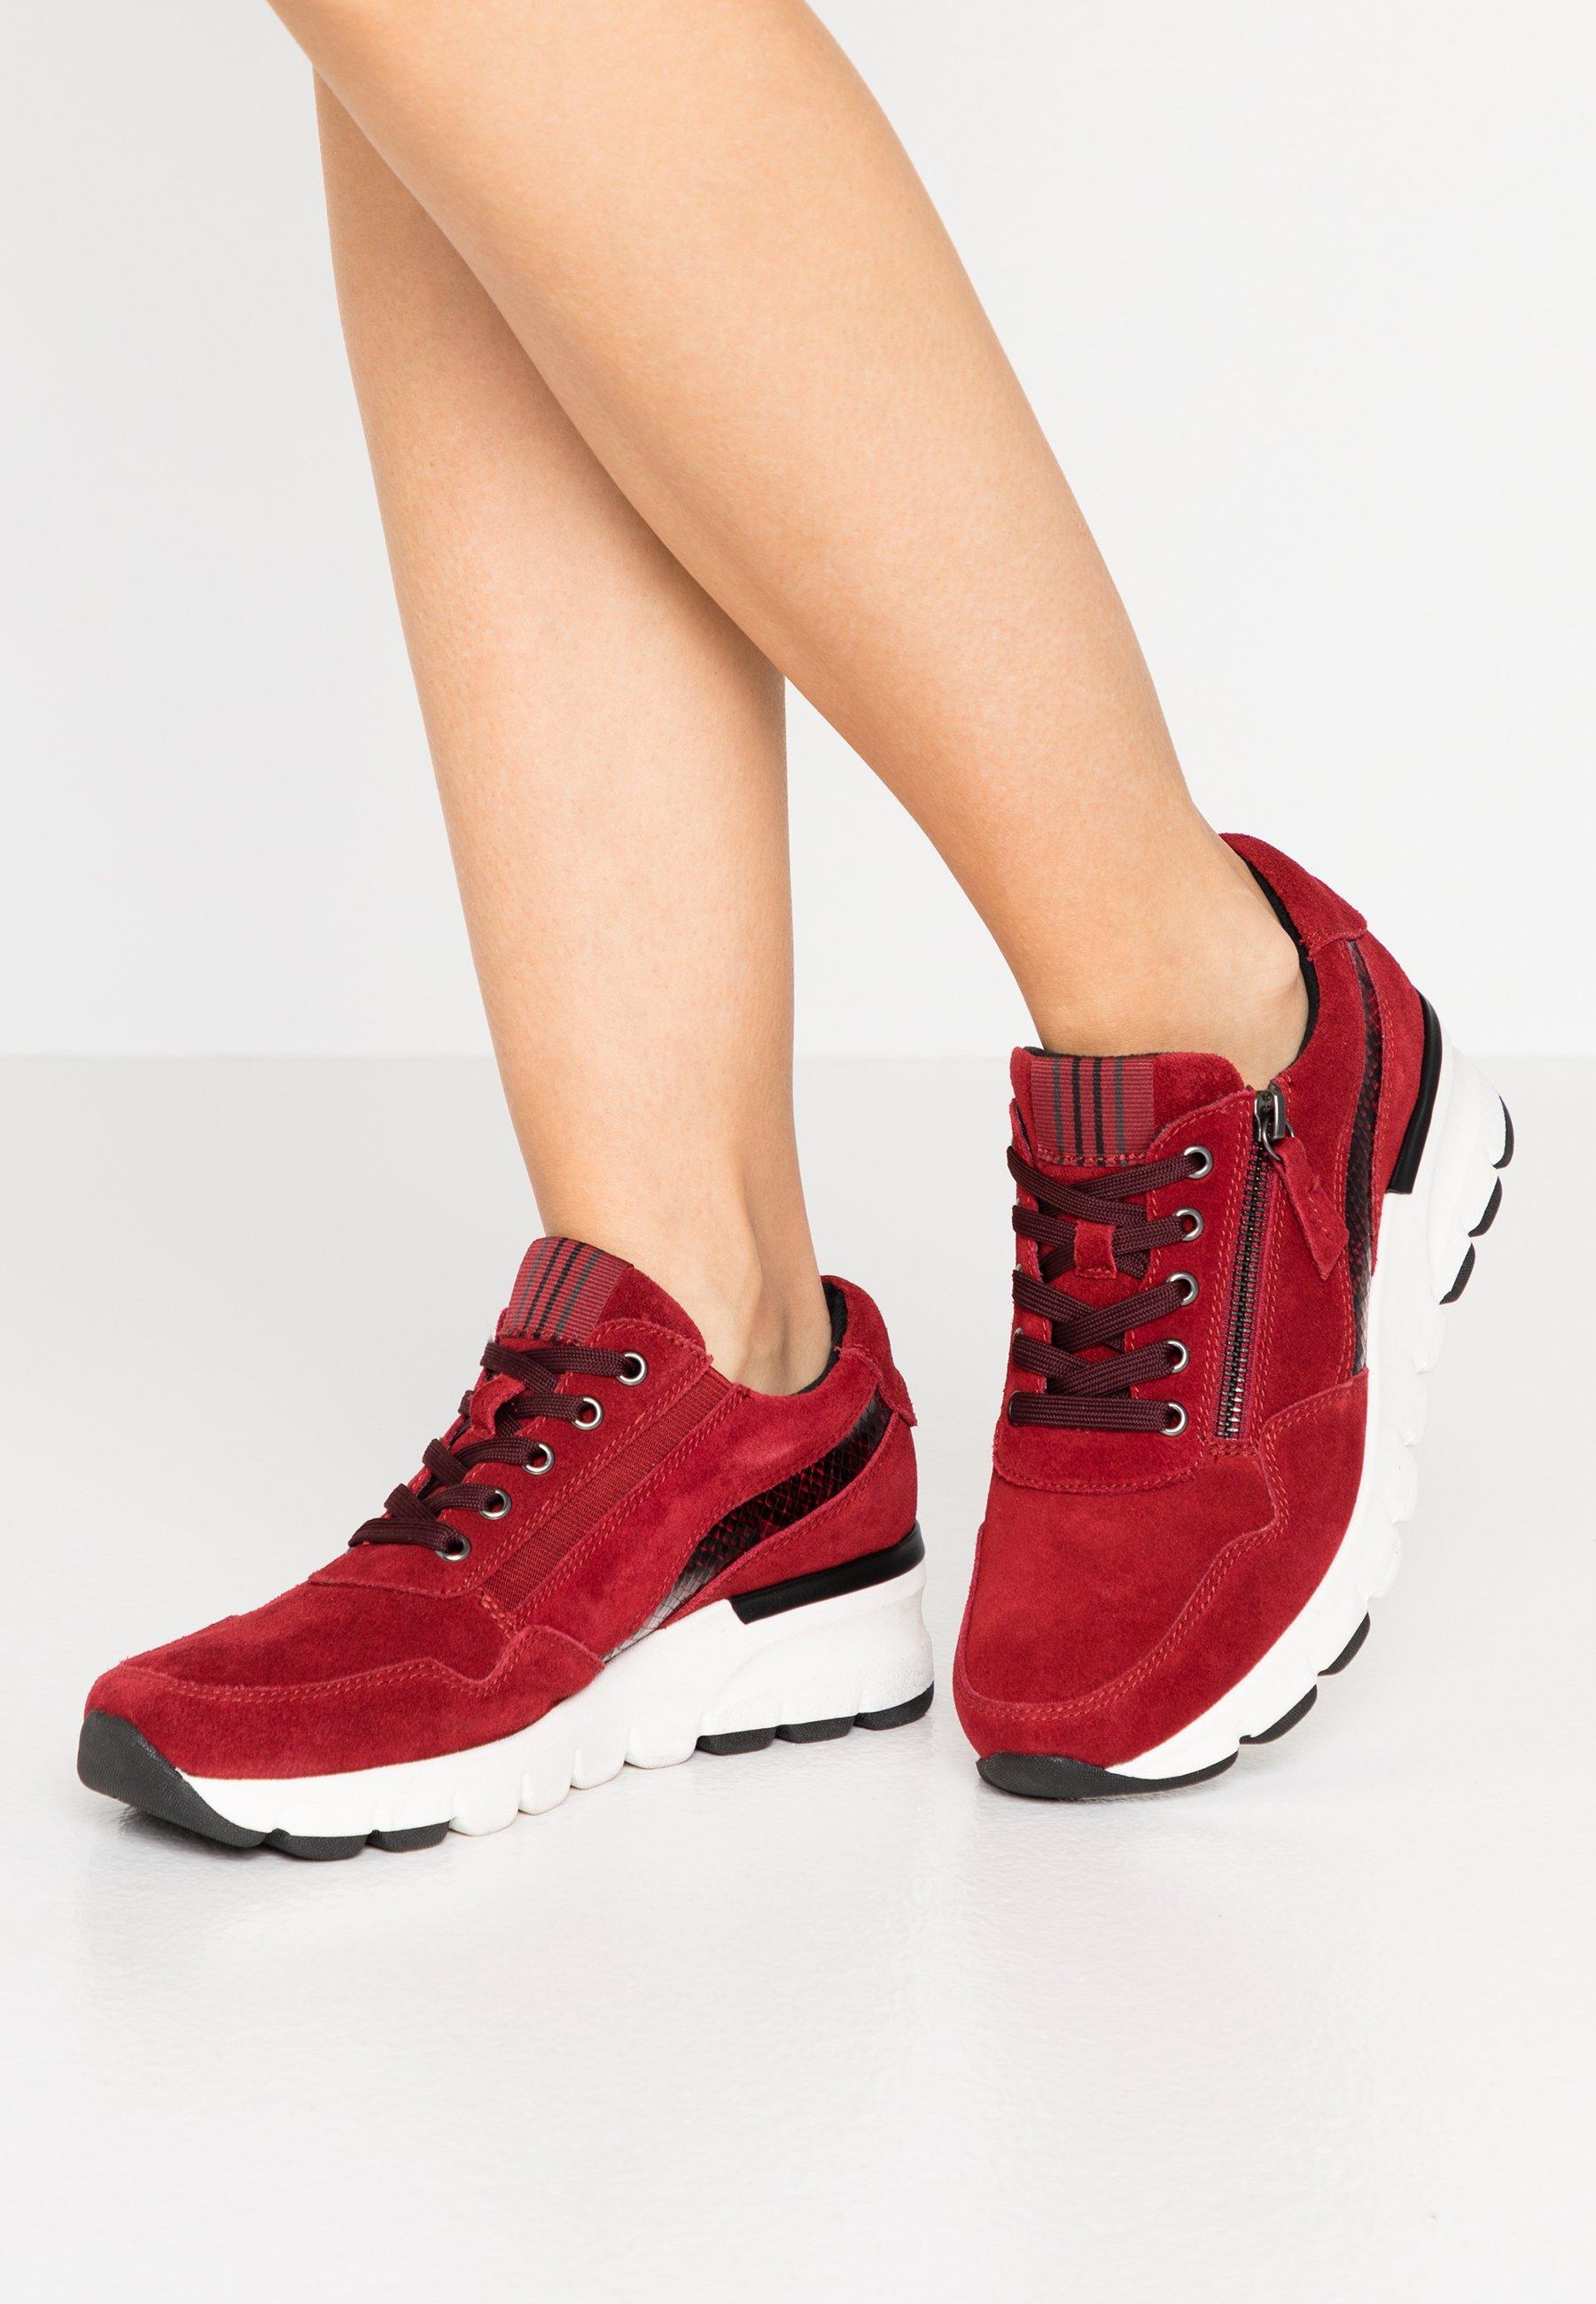 Amazing Price Up To Date Women's Shoes Jana Trainers merlot fcg4gu9gI 5ivXM02b8